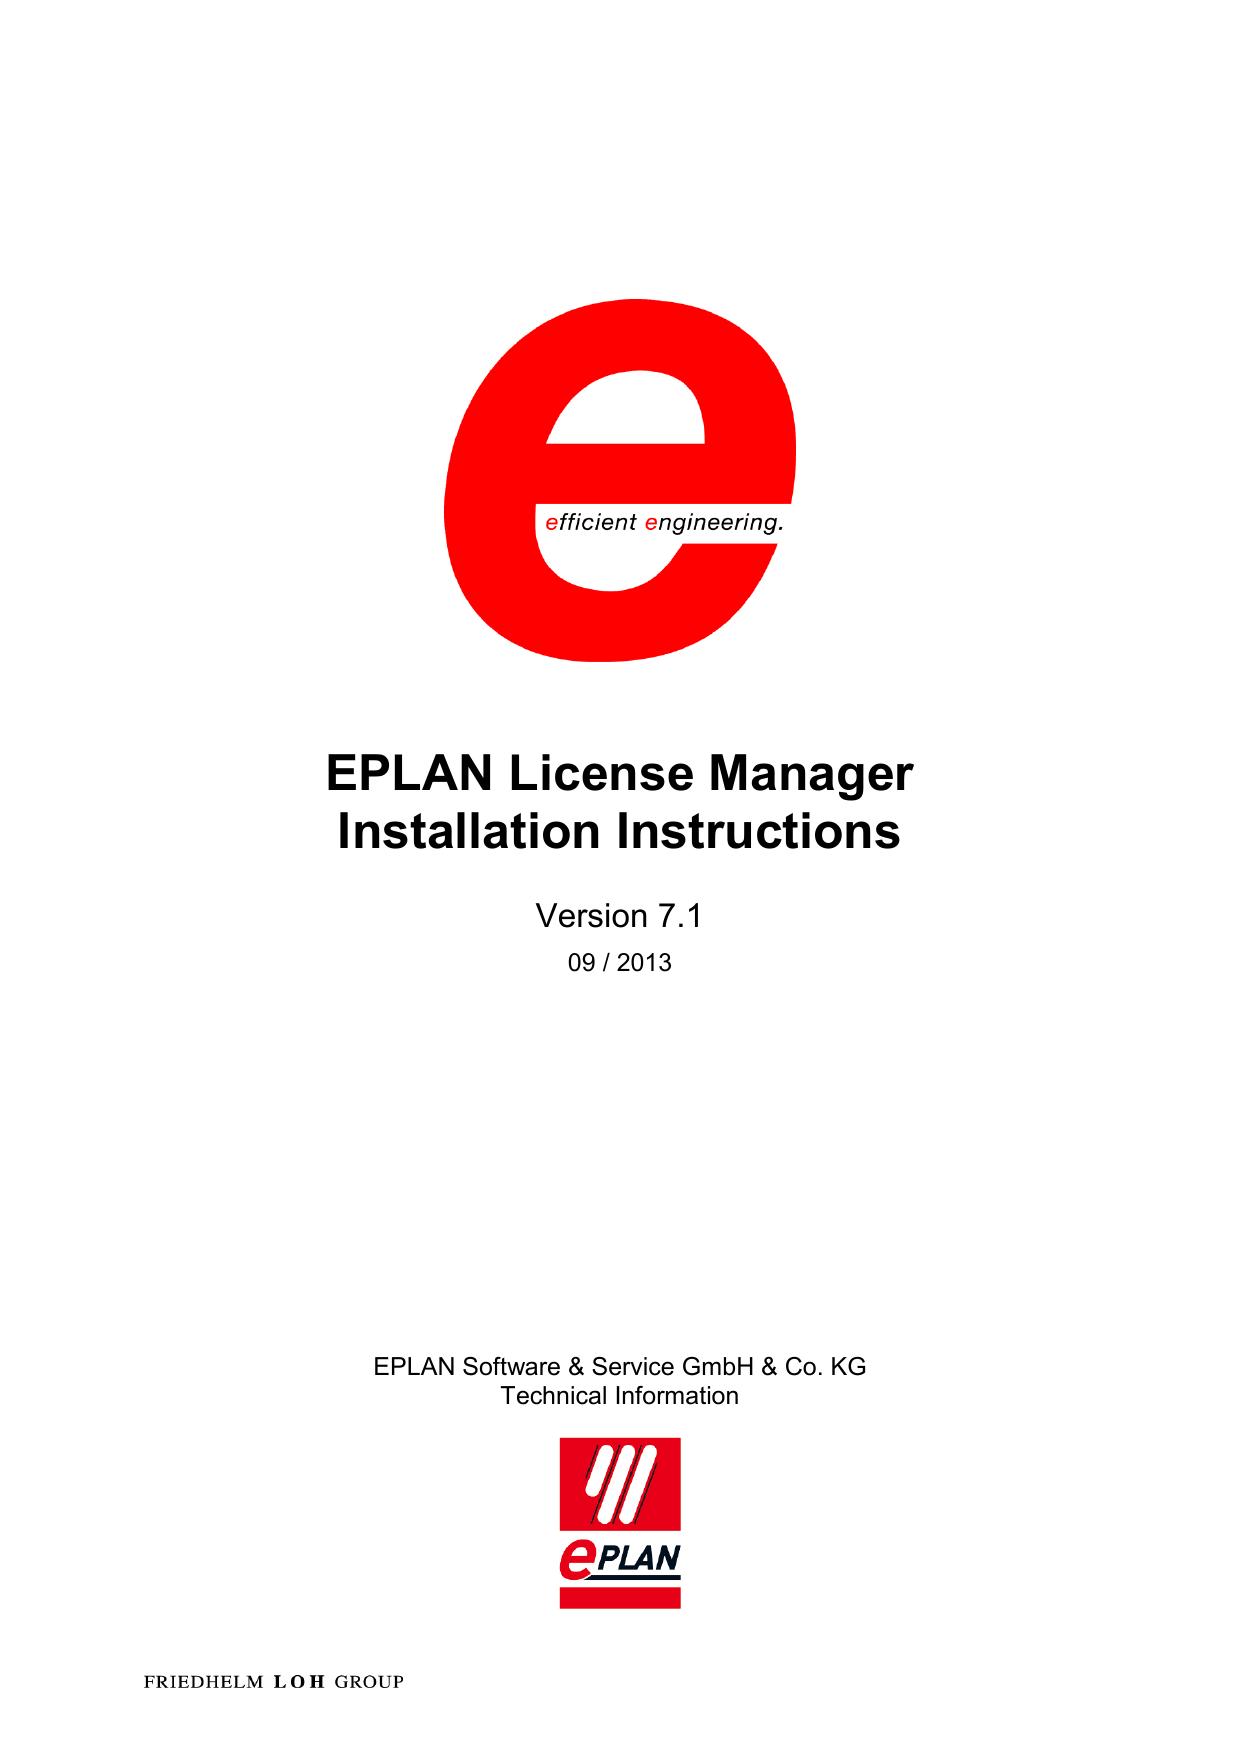 EPLAN License Manager Installation Instructions   manualzz com